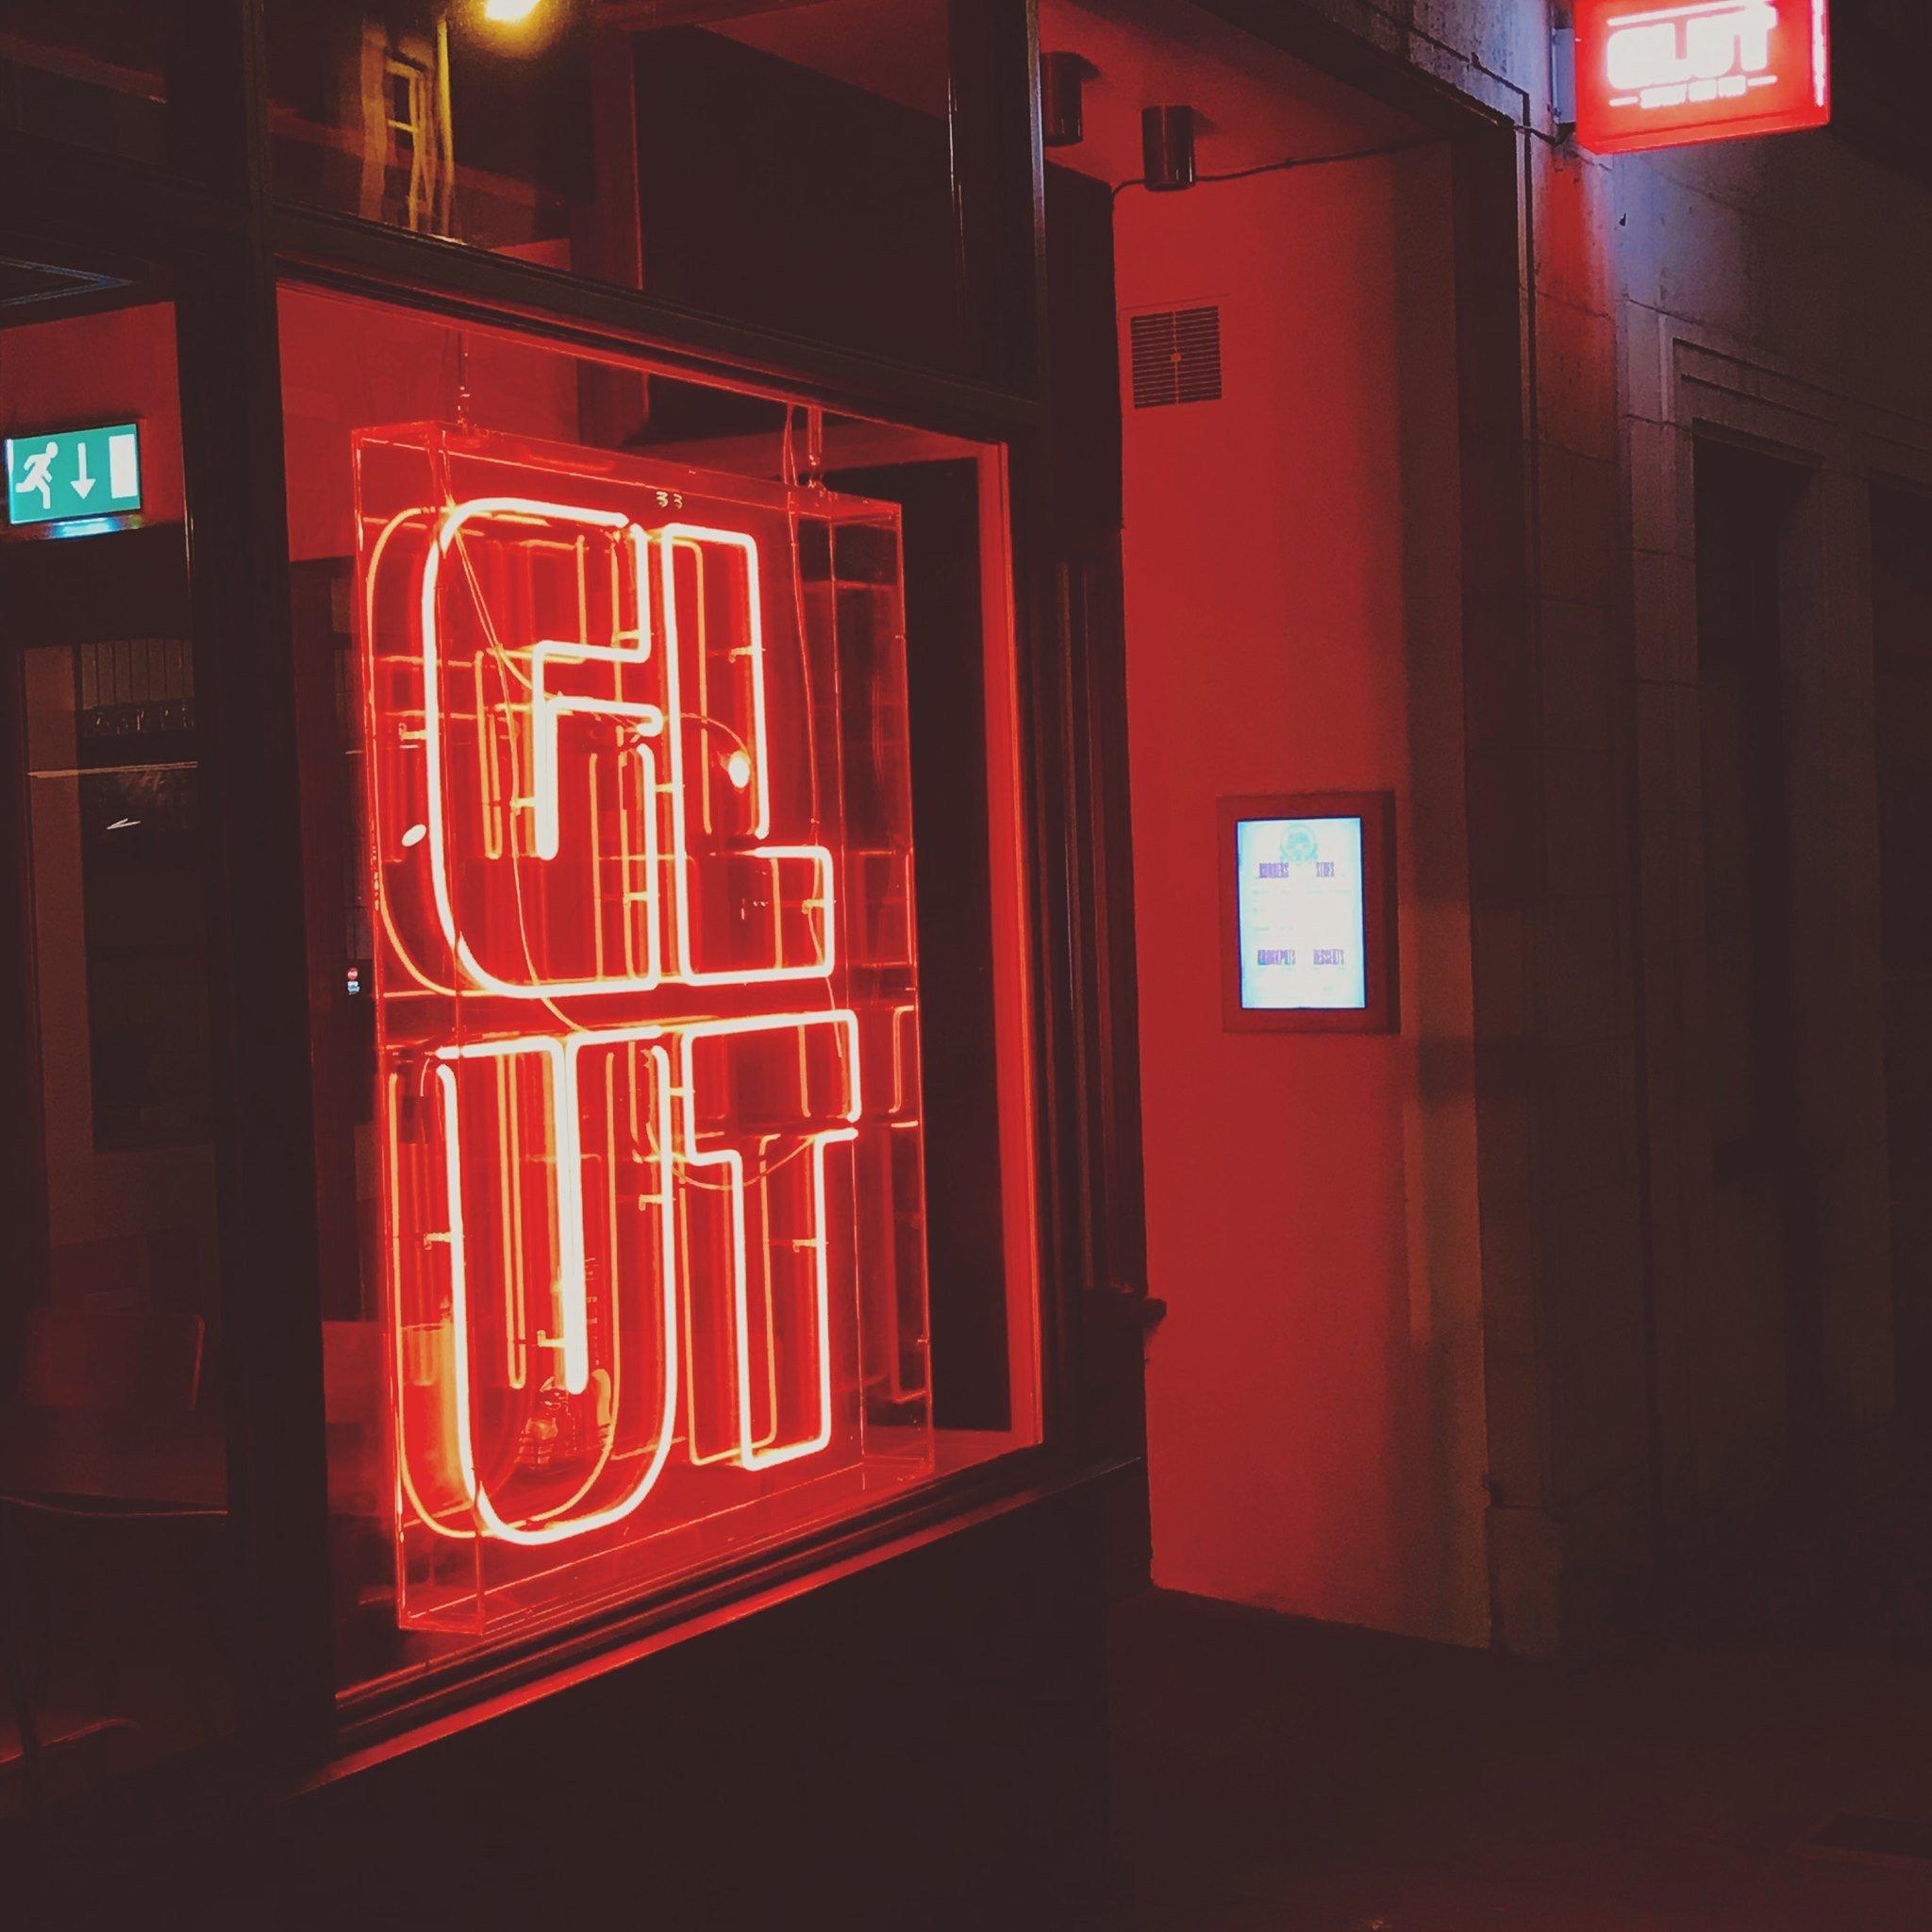 Glut, Oxford - Burger Restaurant - Gallery Image 09